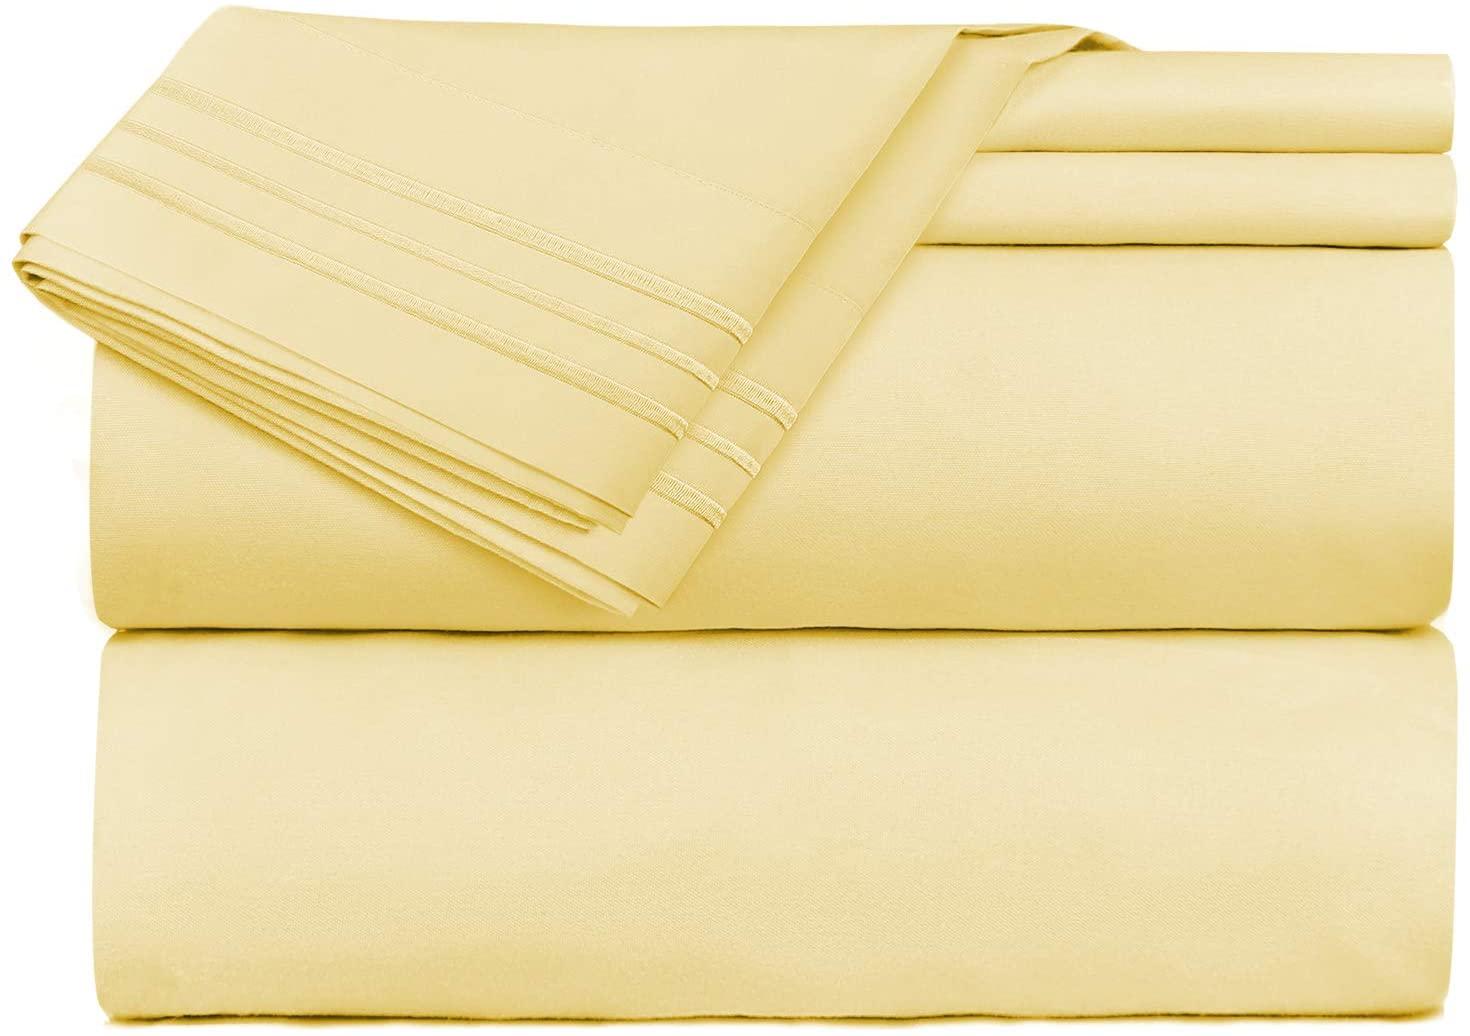 Clara Clark Premier 1800 Series 4 Piece Sheet Set Deep Pocket Brushed Microfiber, Wrinkle, Fade & Stain Resistant, Cal-King, Custard Mellow